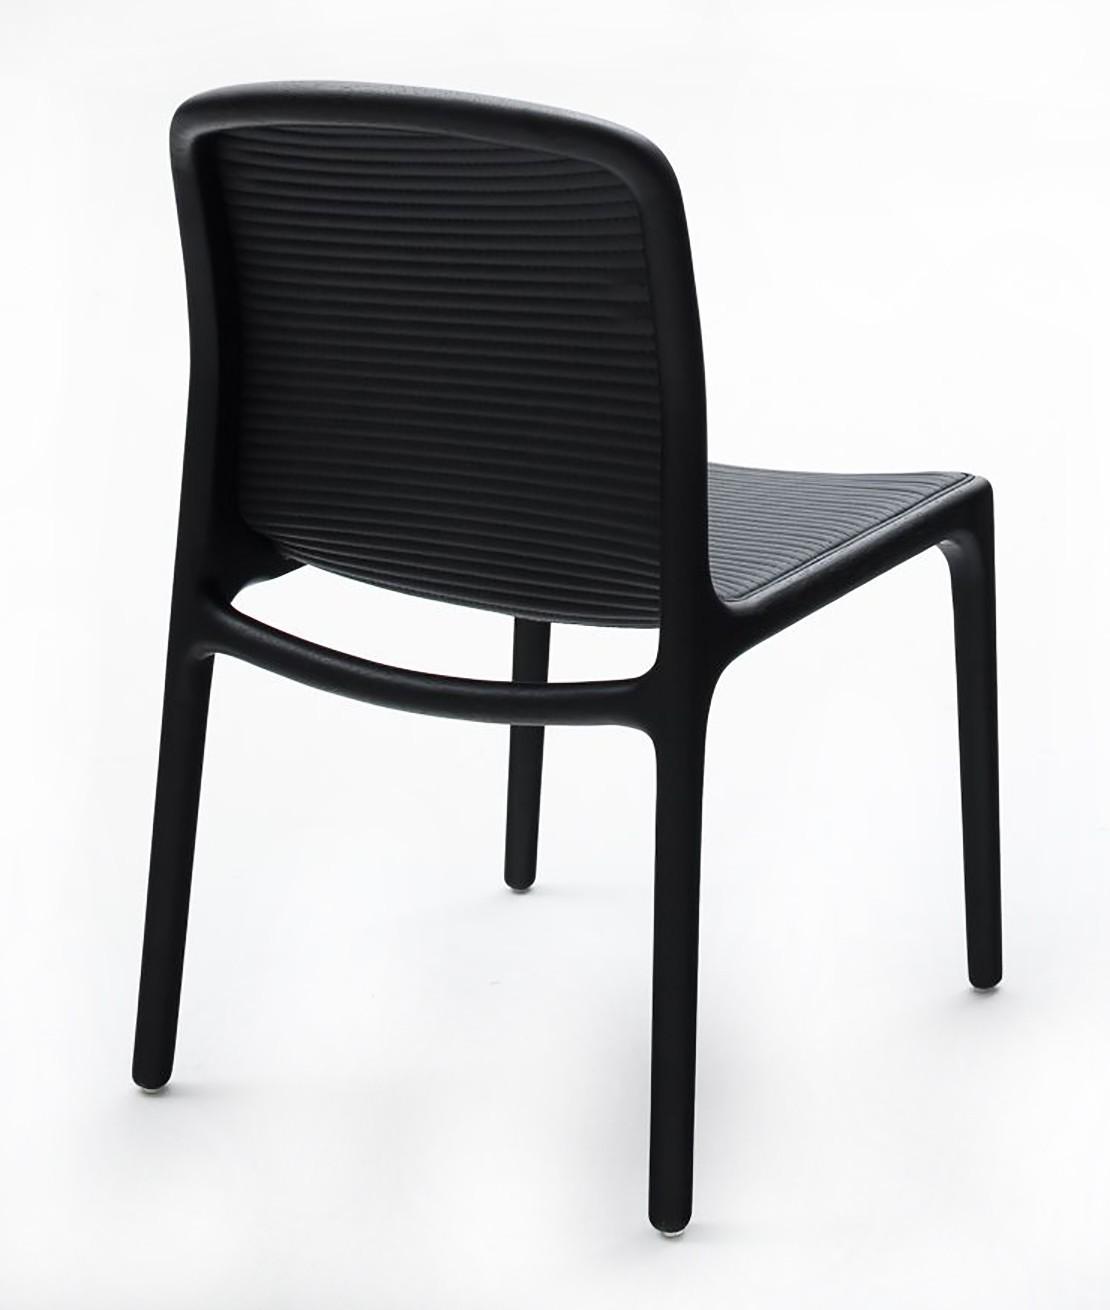 Cadeira Zia • estudiobola